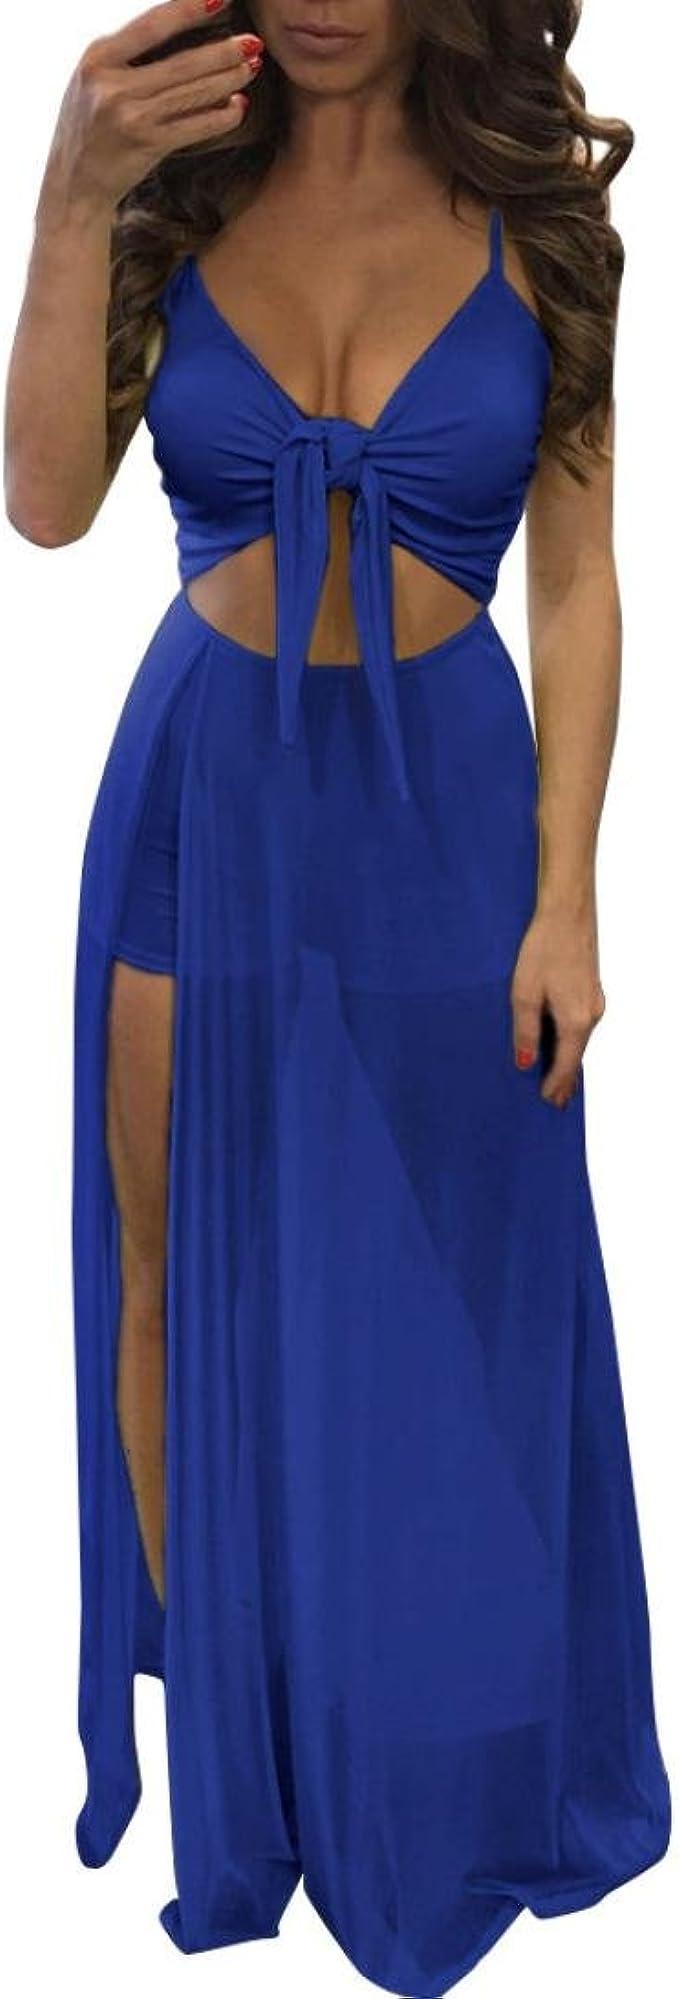 YOUBan Damen Sexy Kleid Jumpsuit Strampler Kurze Hose Kleid